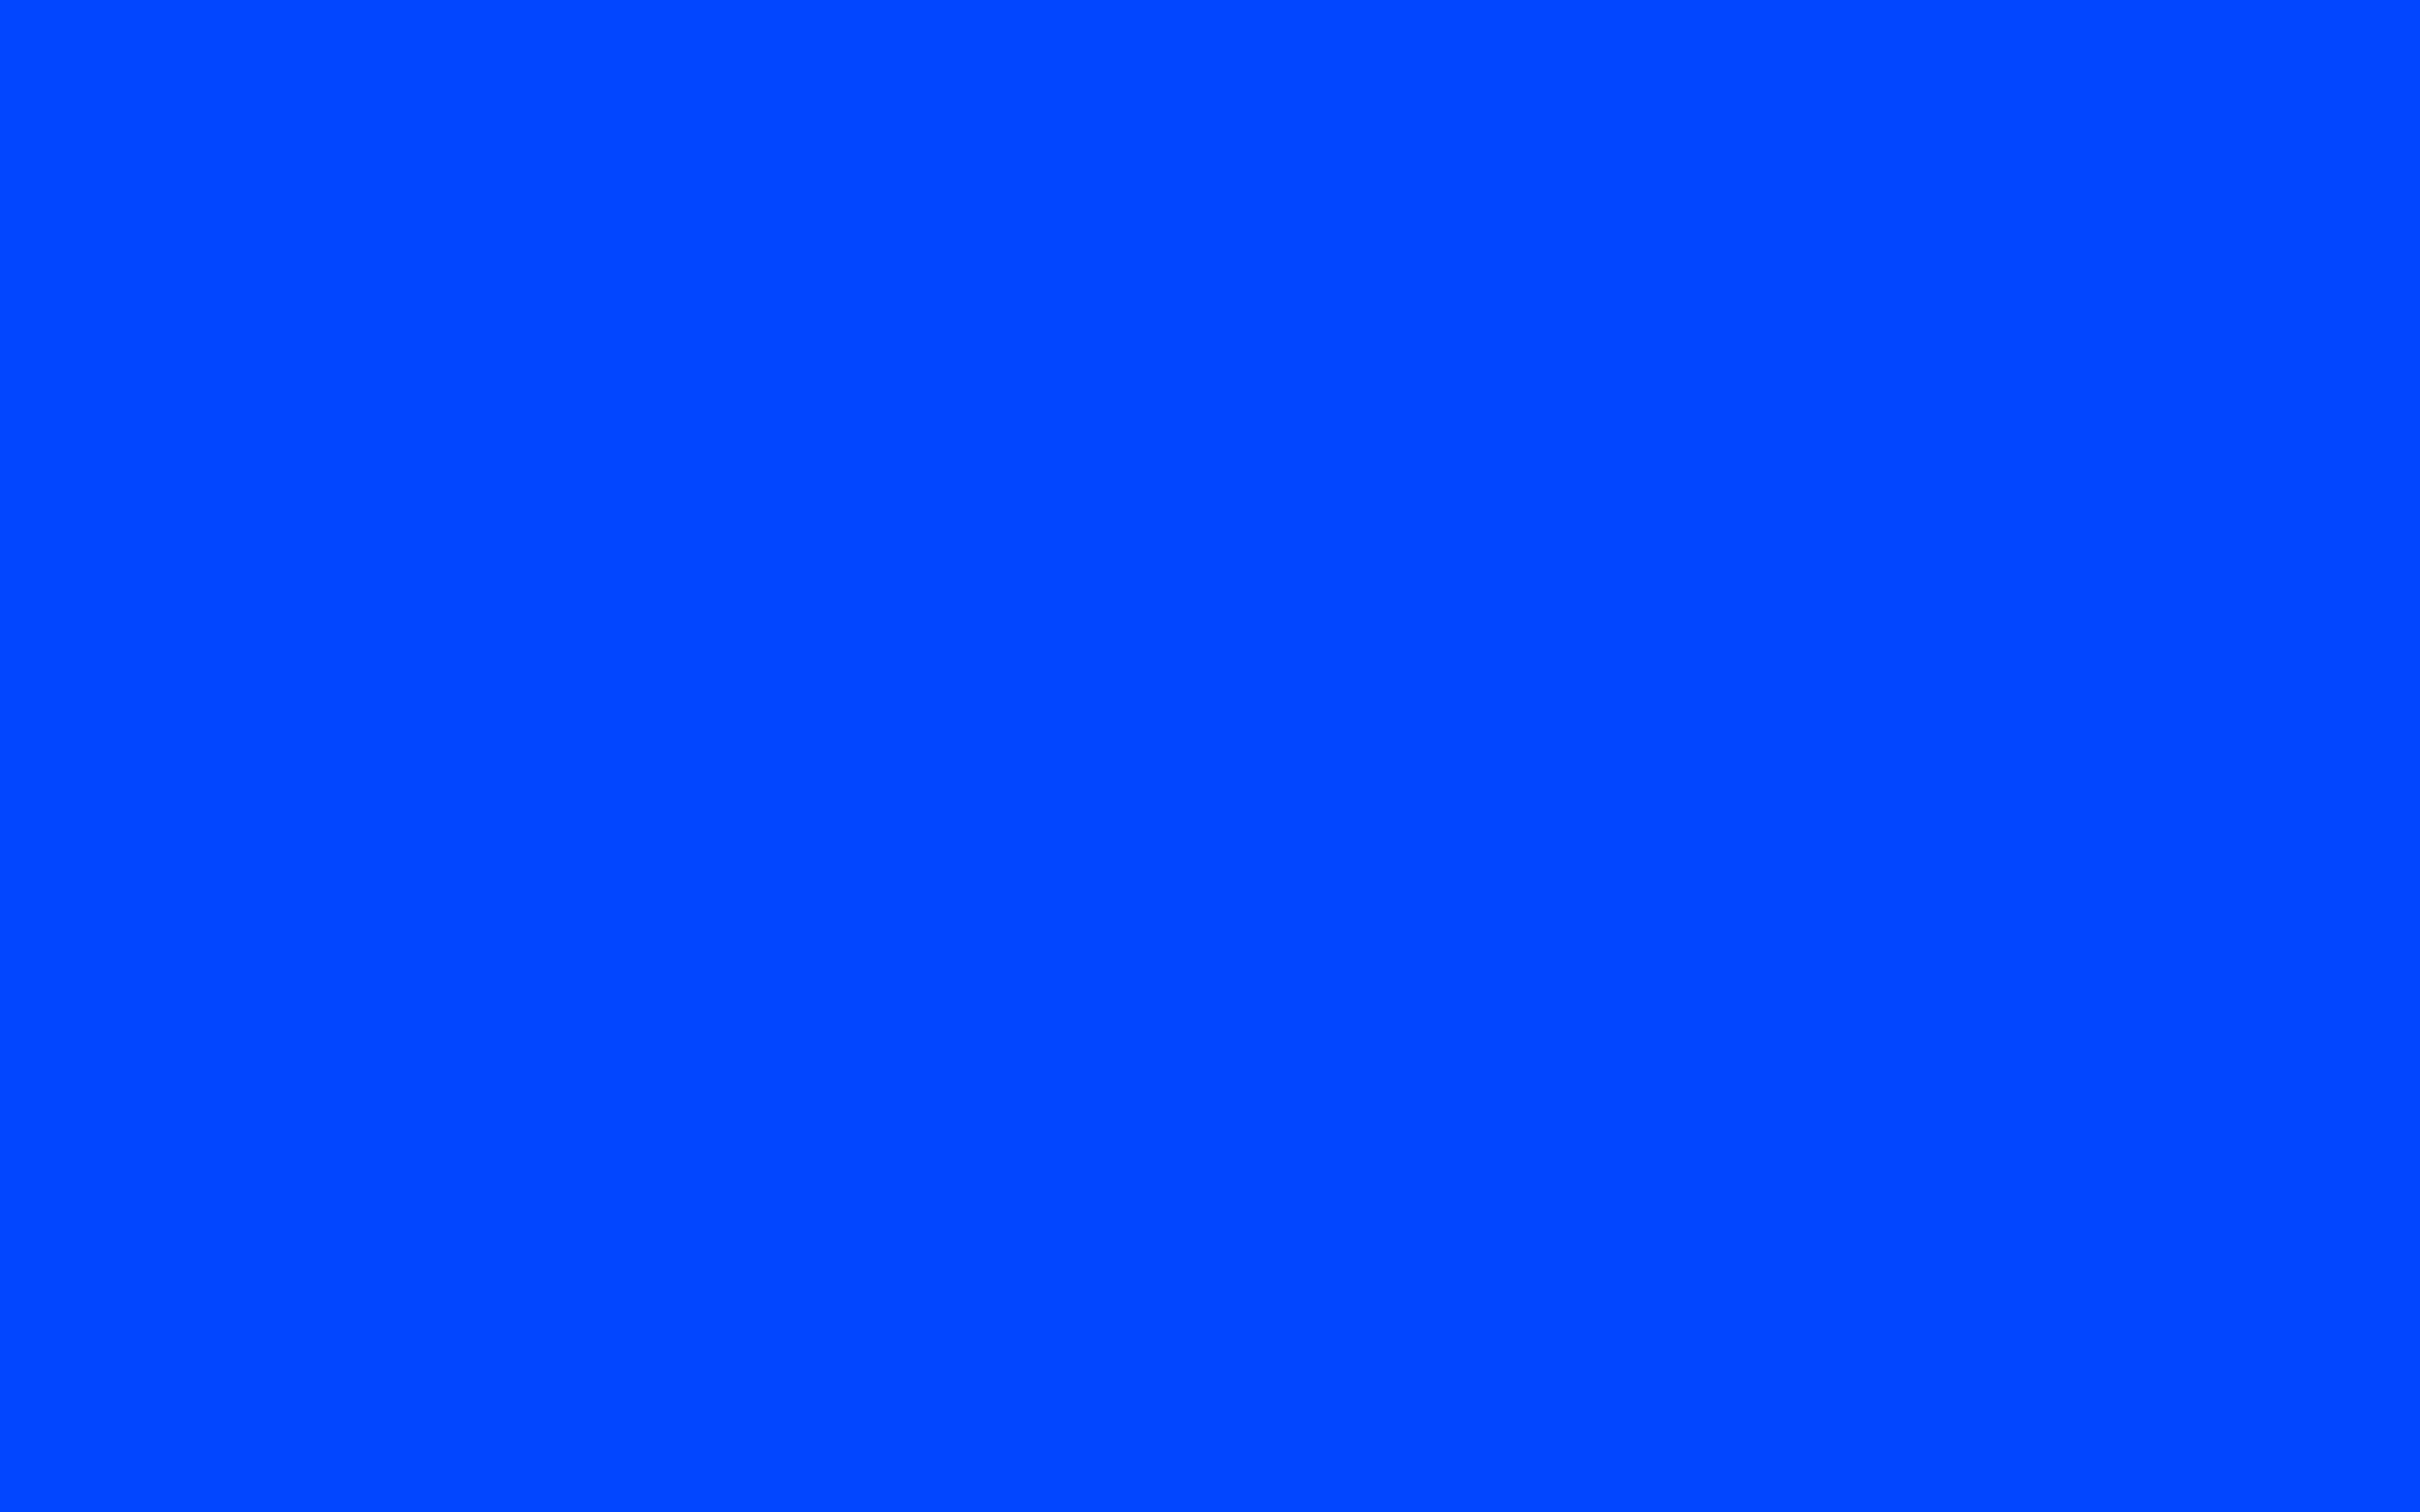 Solid Blue Background Wallpaper 61 Images